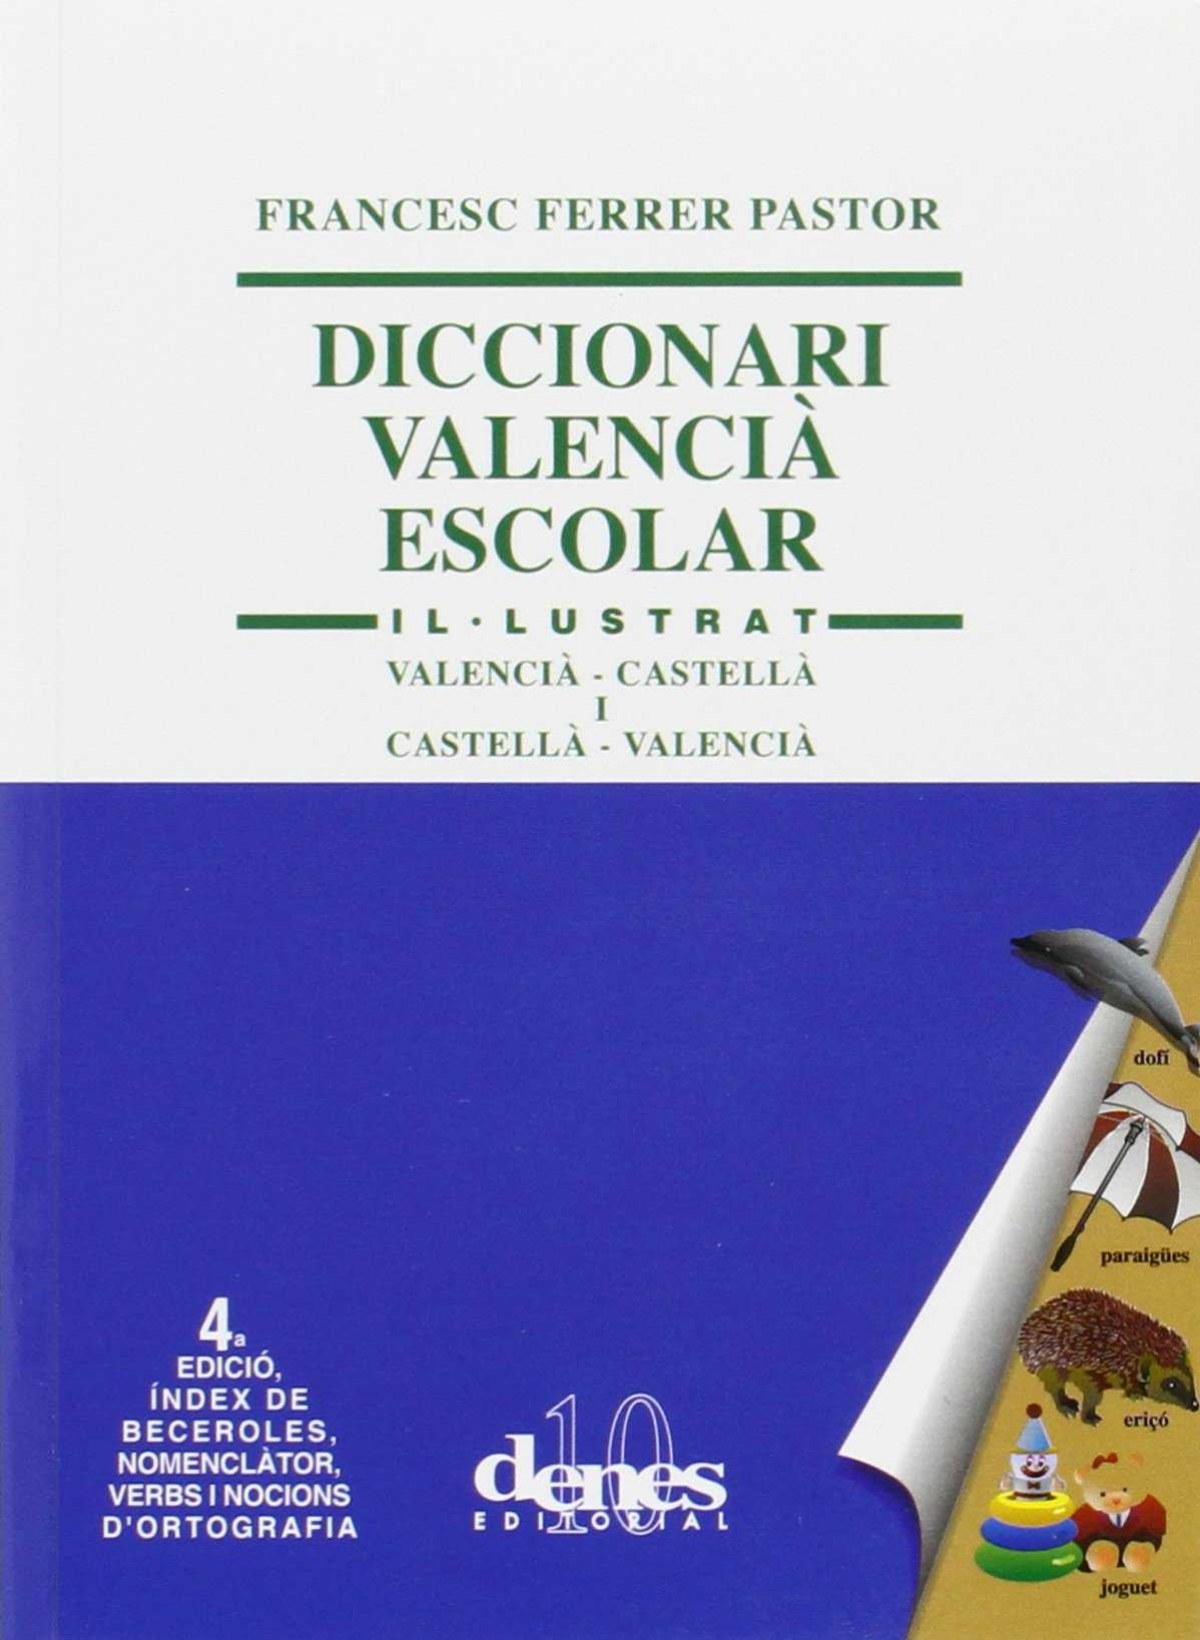 Diccionari valencia escolar. Il·lustrat 9788496545342